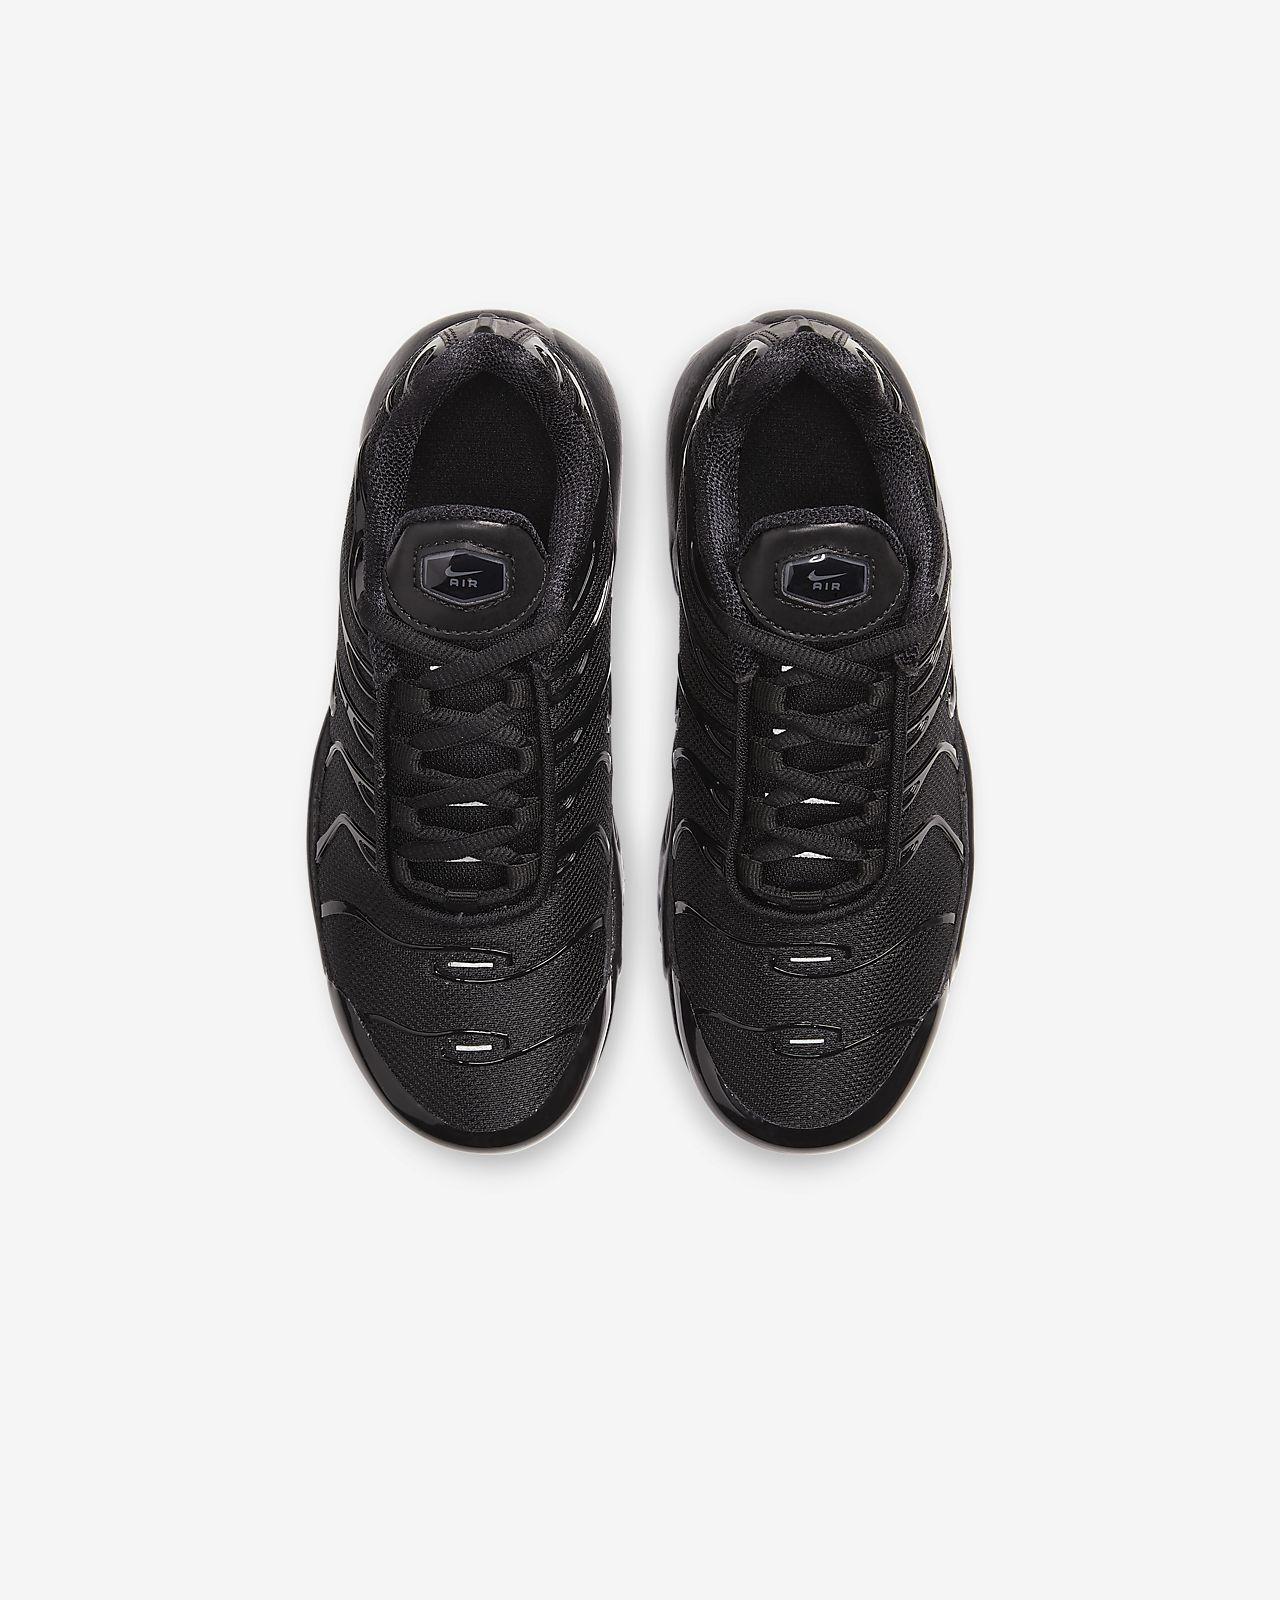 Nike Air Max Plus Schuh für jüngere Kinder